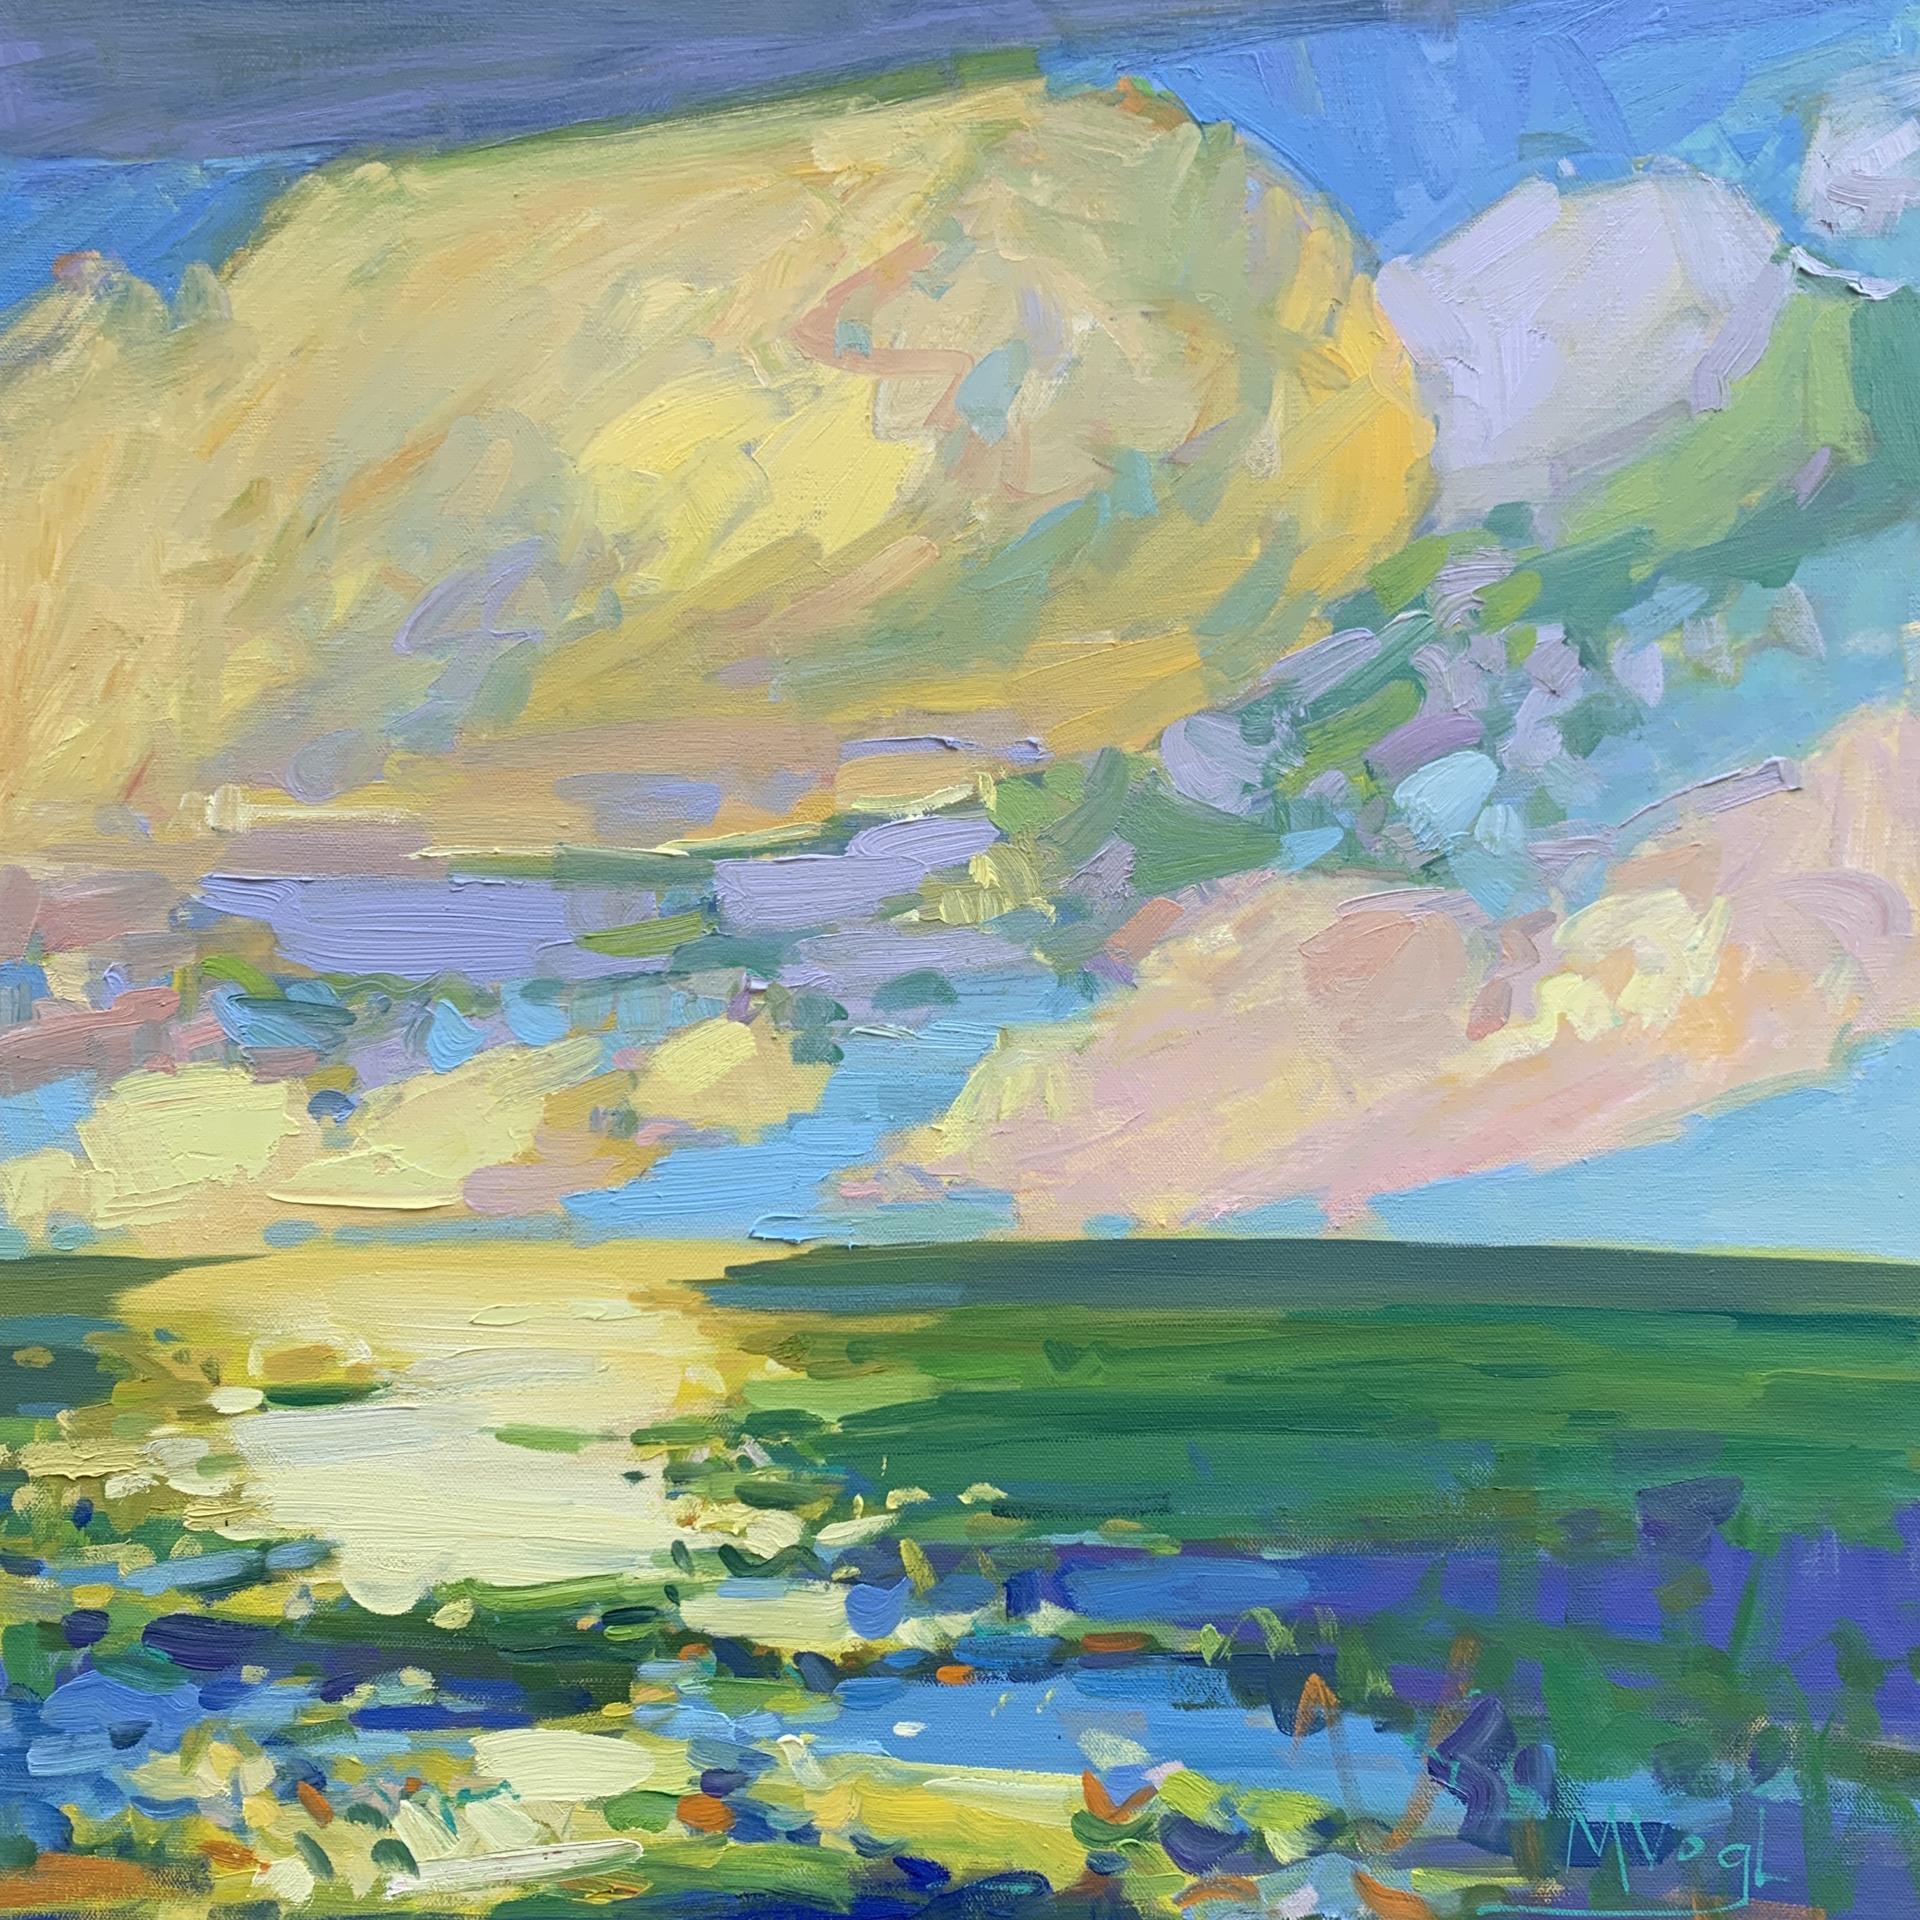 Sun Salutation by Marissa Vogl